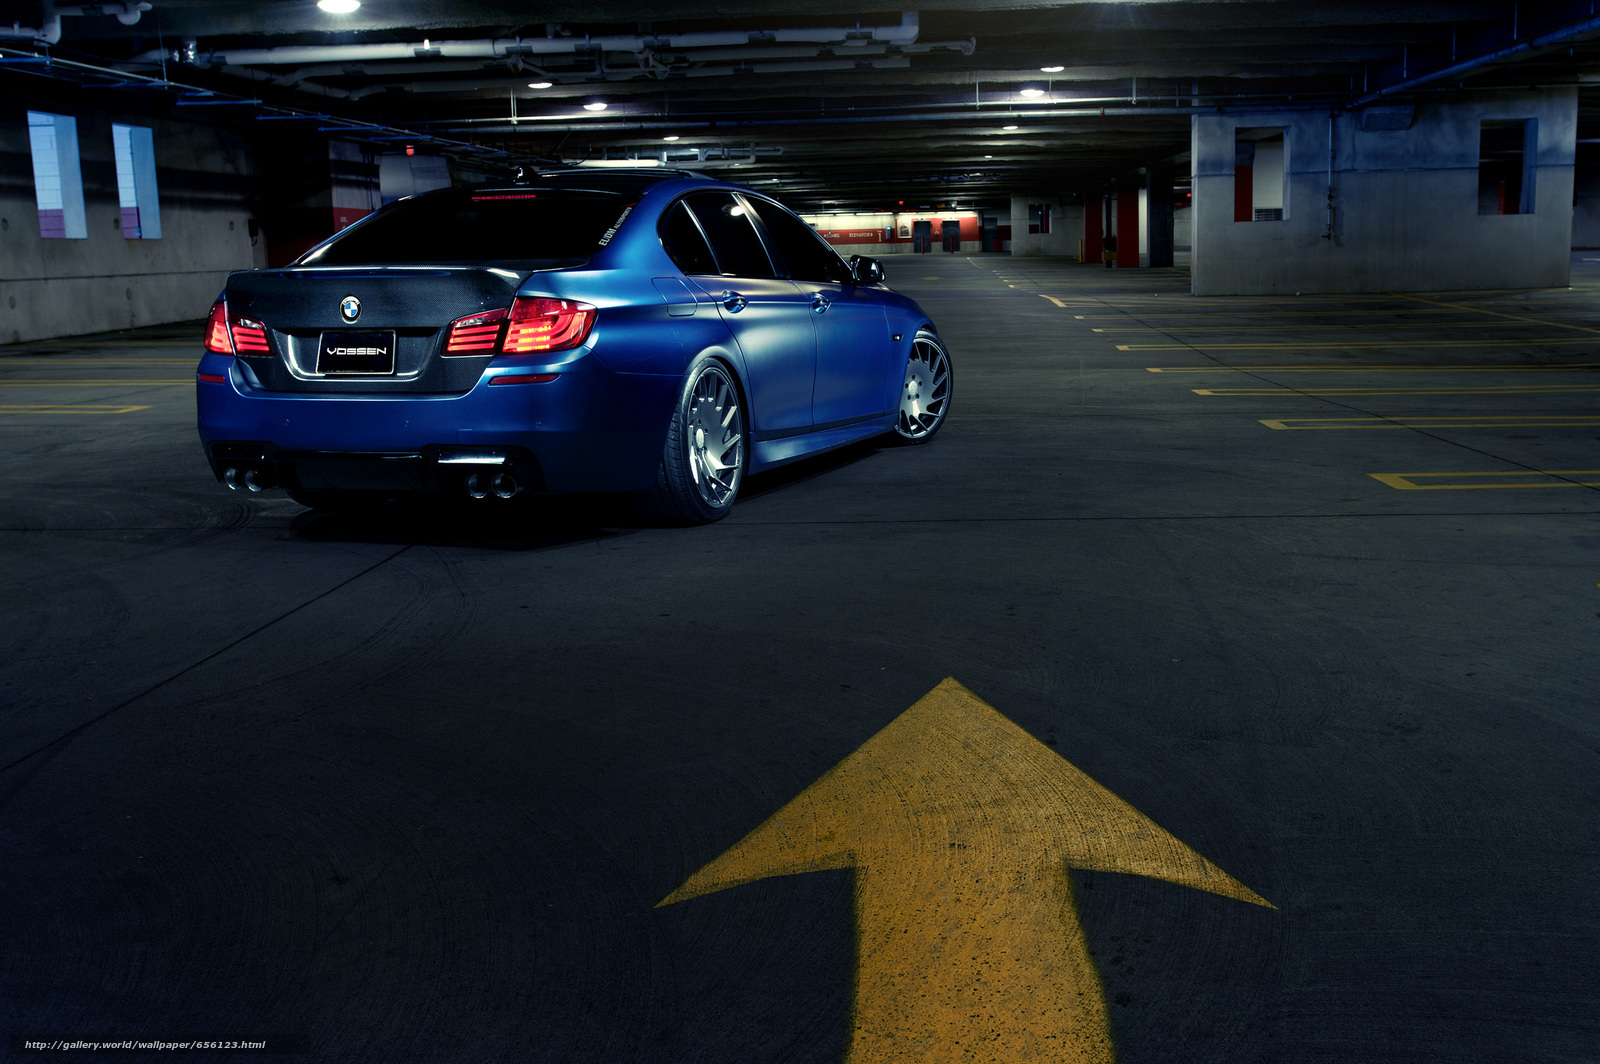 Download wallpaper BMW,  machine,  car free desktop wallpaper in the resolution 2048x1362 — picture №656123